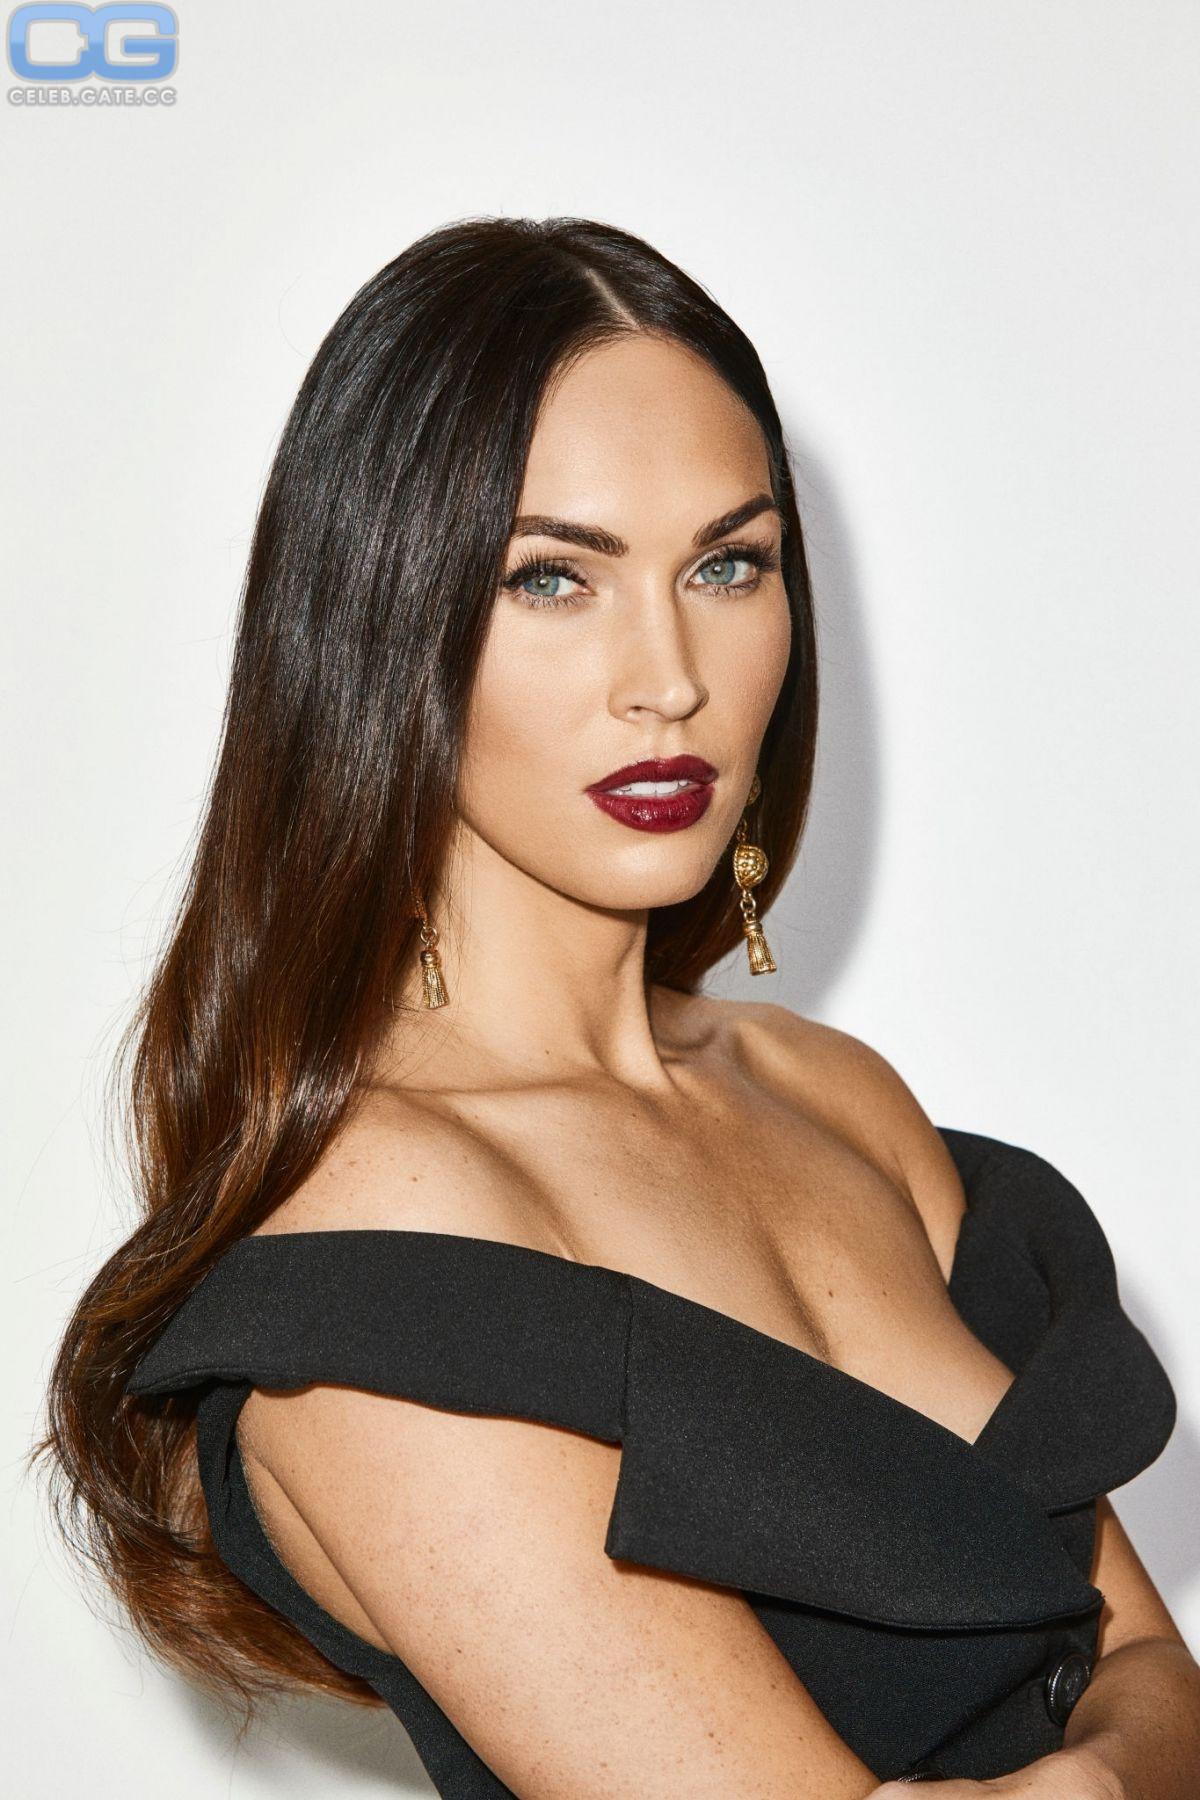 Megan Fox hot